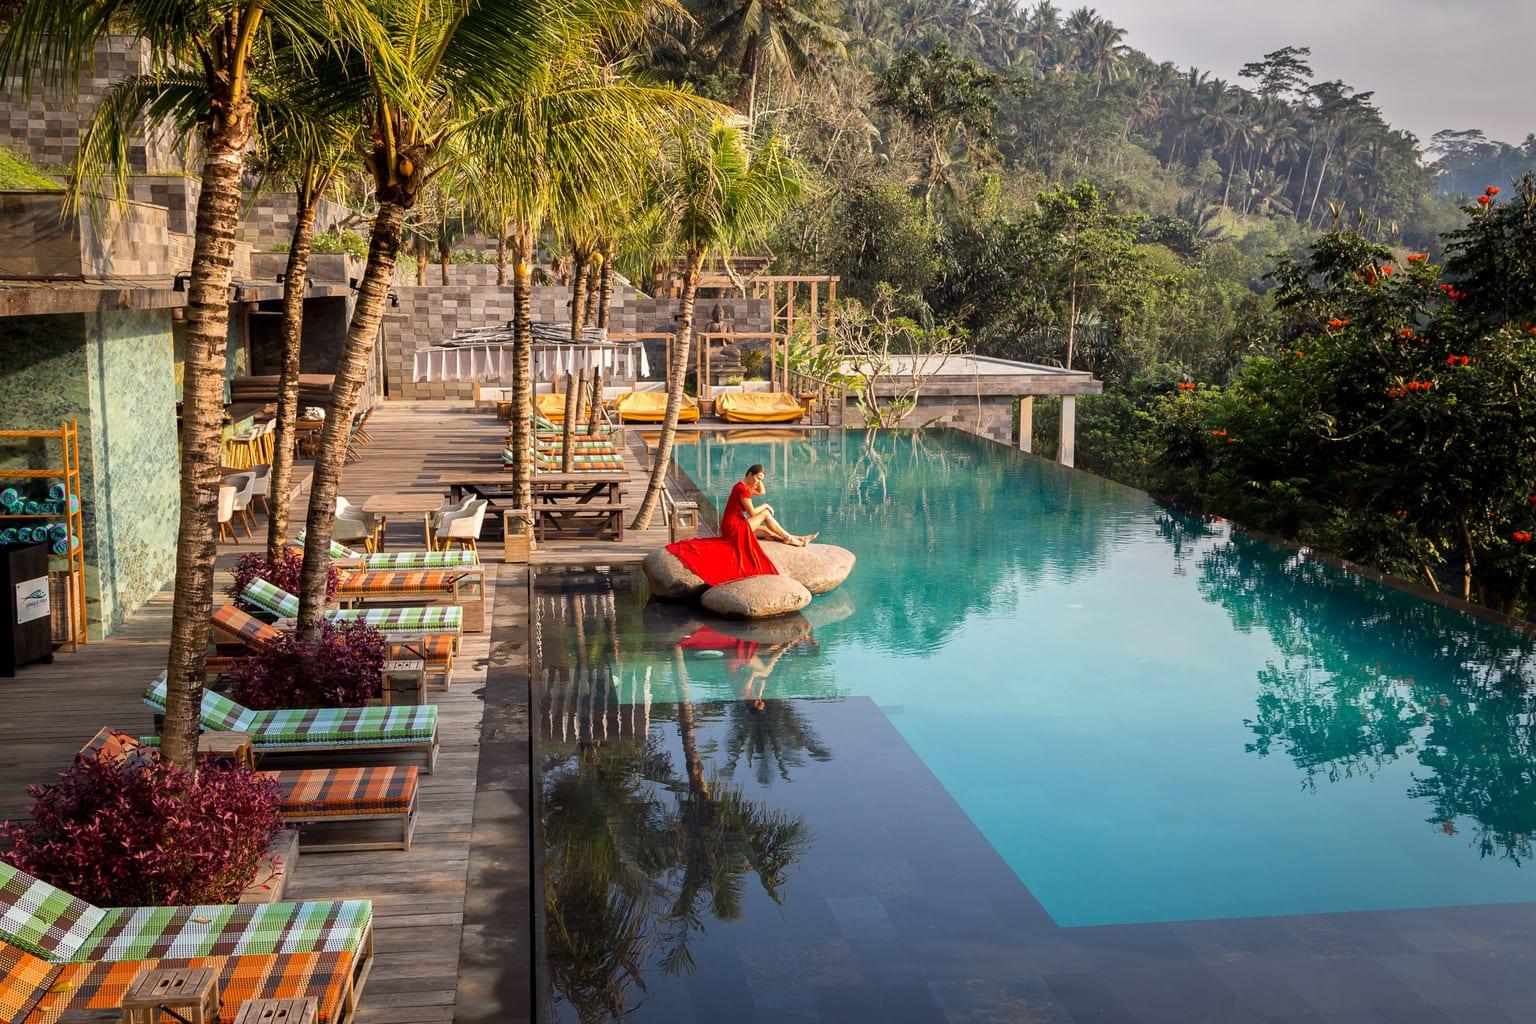 Chapung Se Bali Ubud S Sexy Hip Resort Among Lush Vegetation